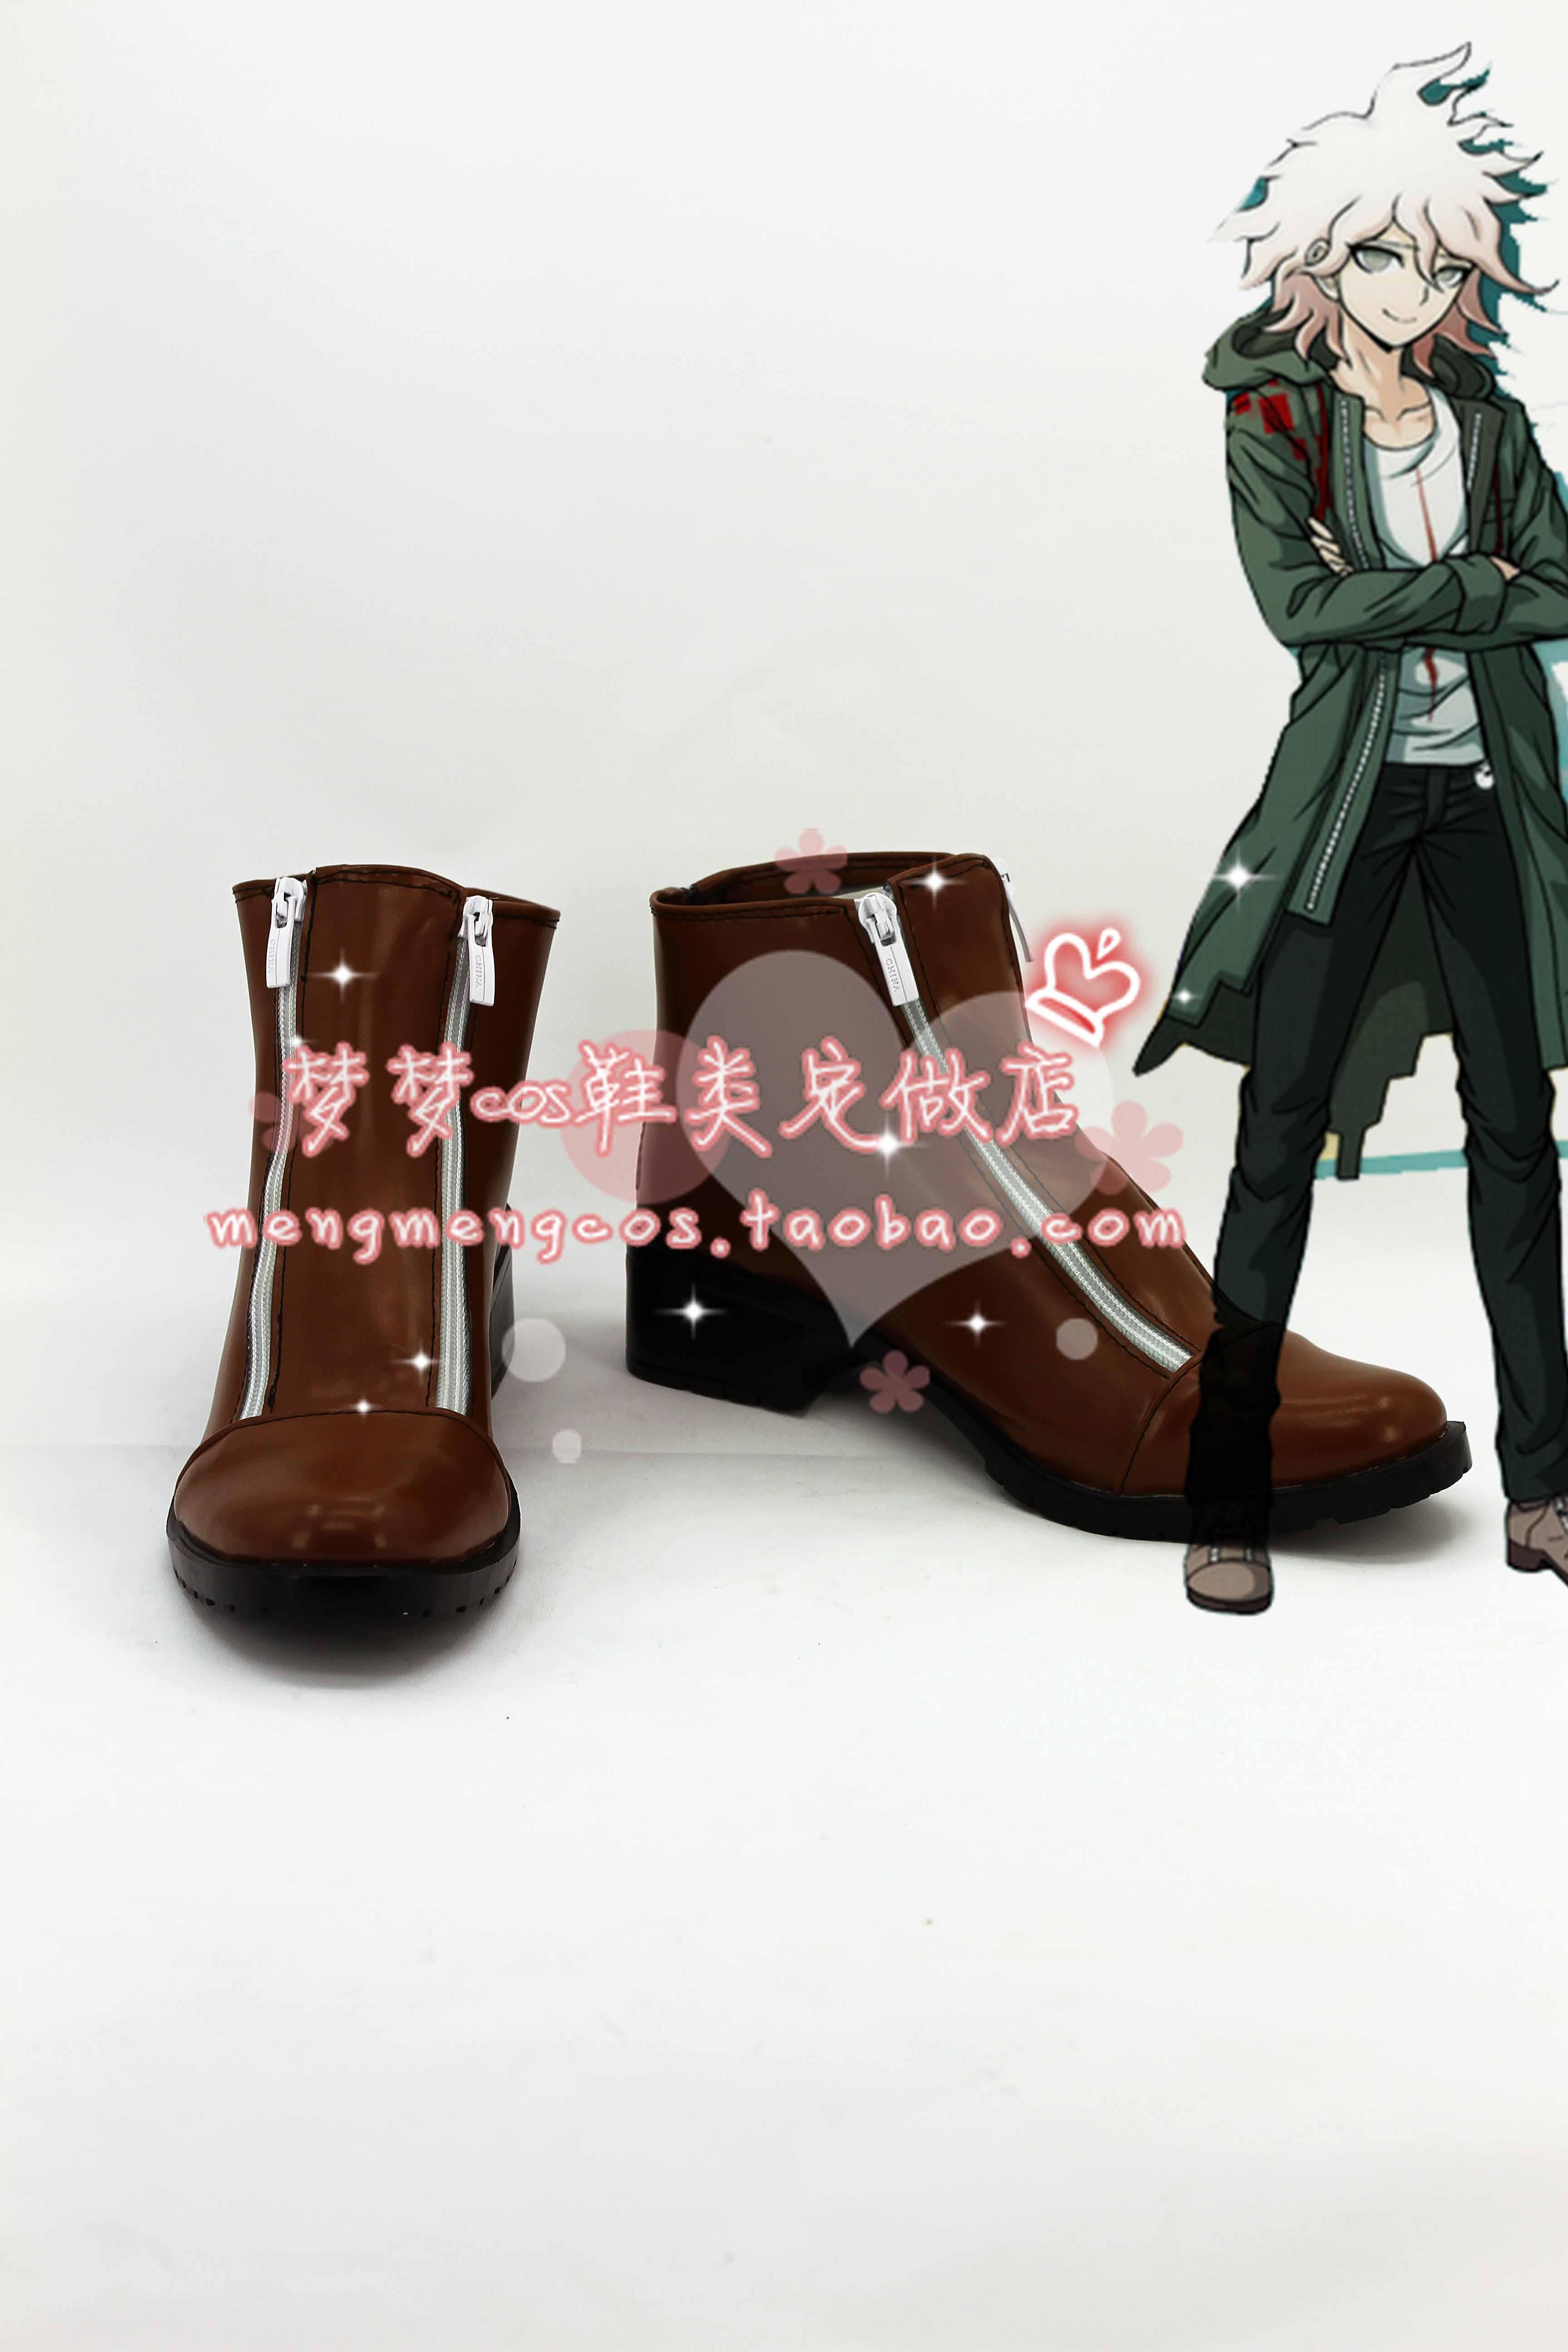 Danganronpa Dangan-Ronpa Nagito Komaeda Cosplay boots shoes<br><br>Aliexpress